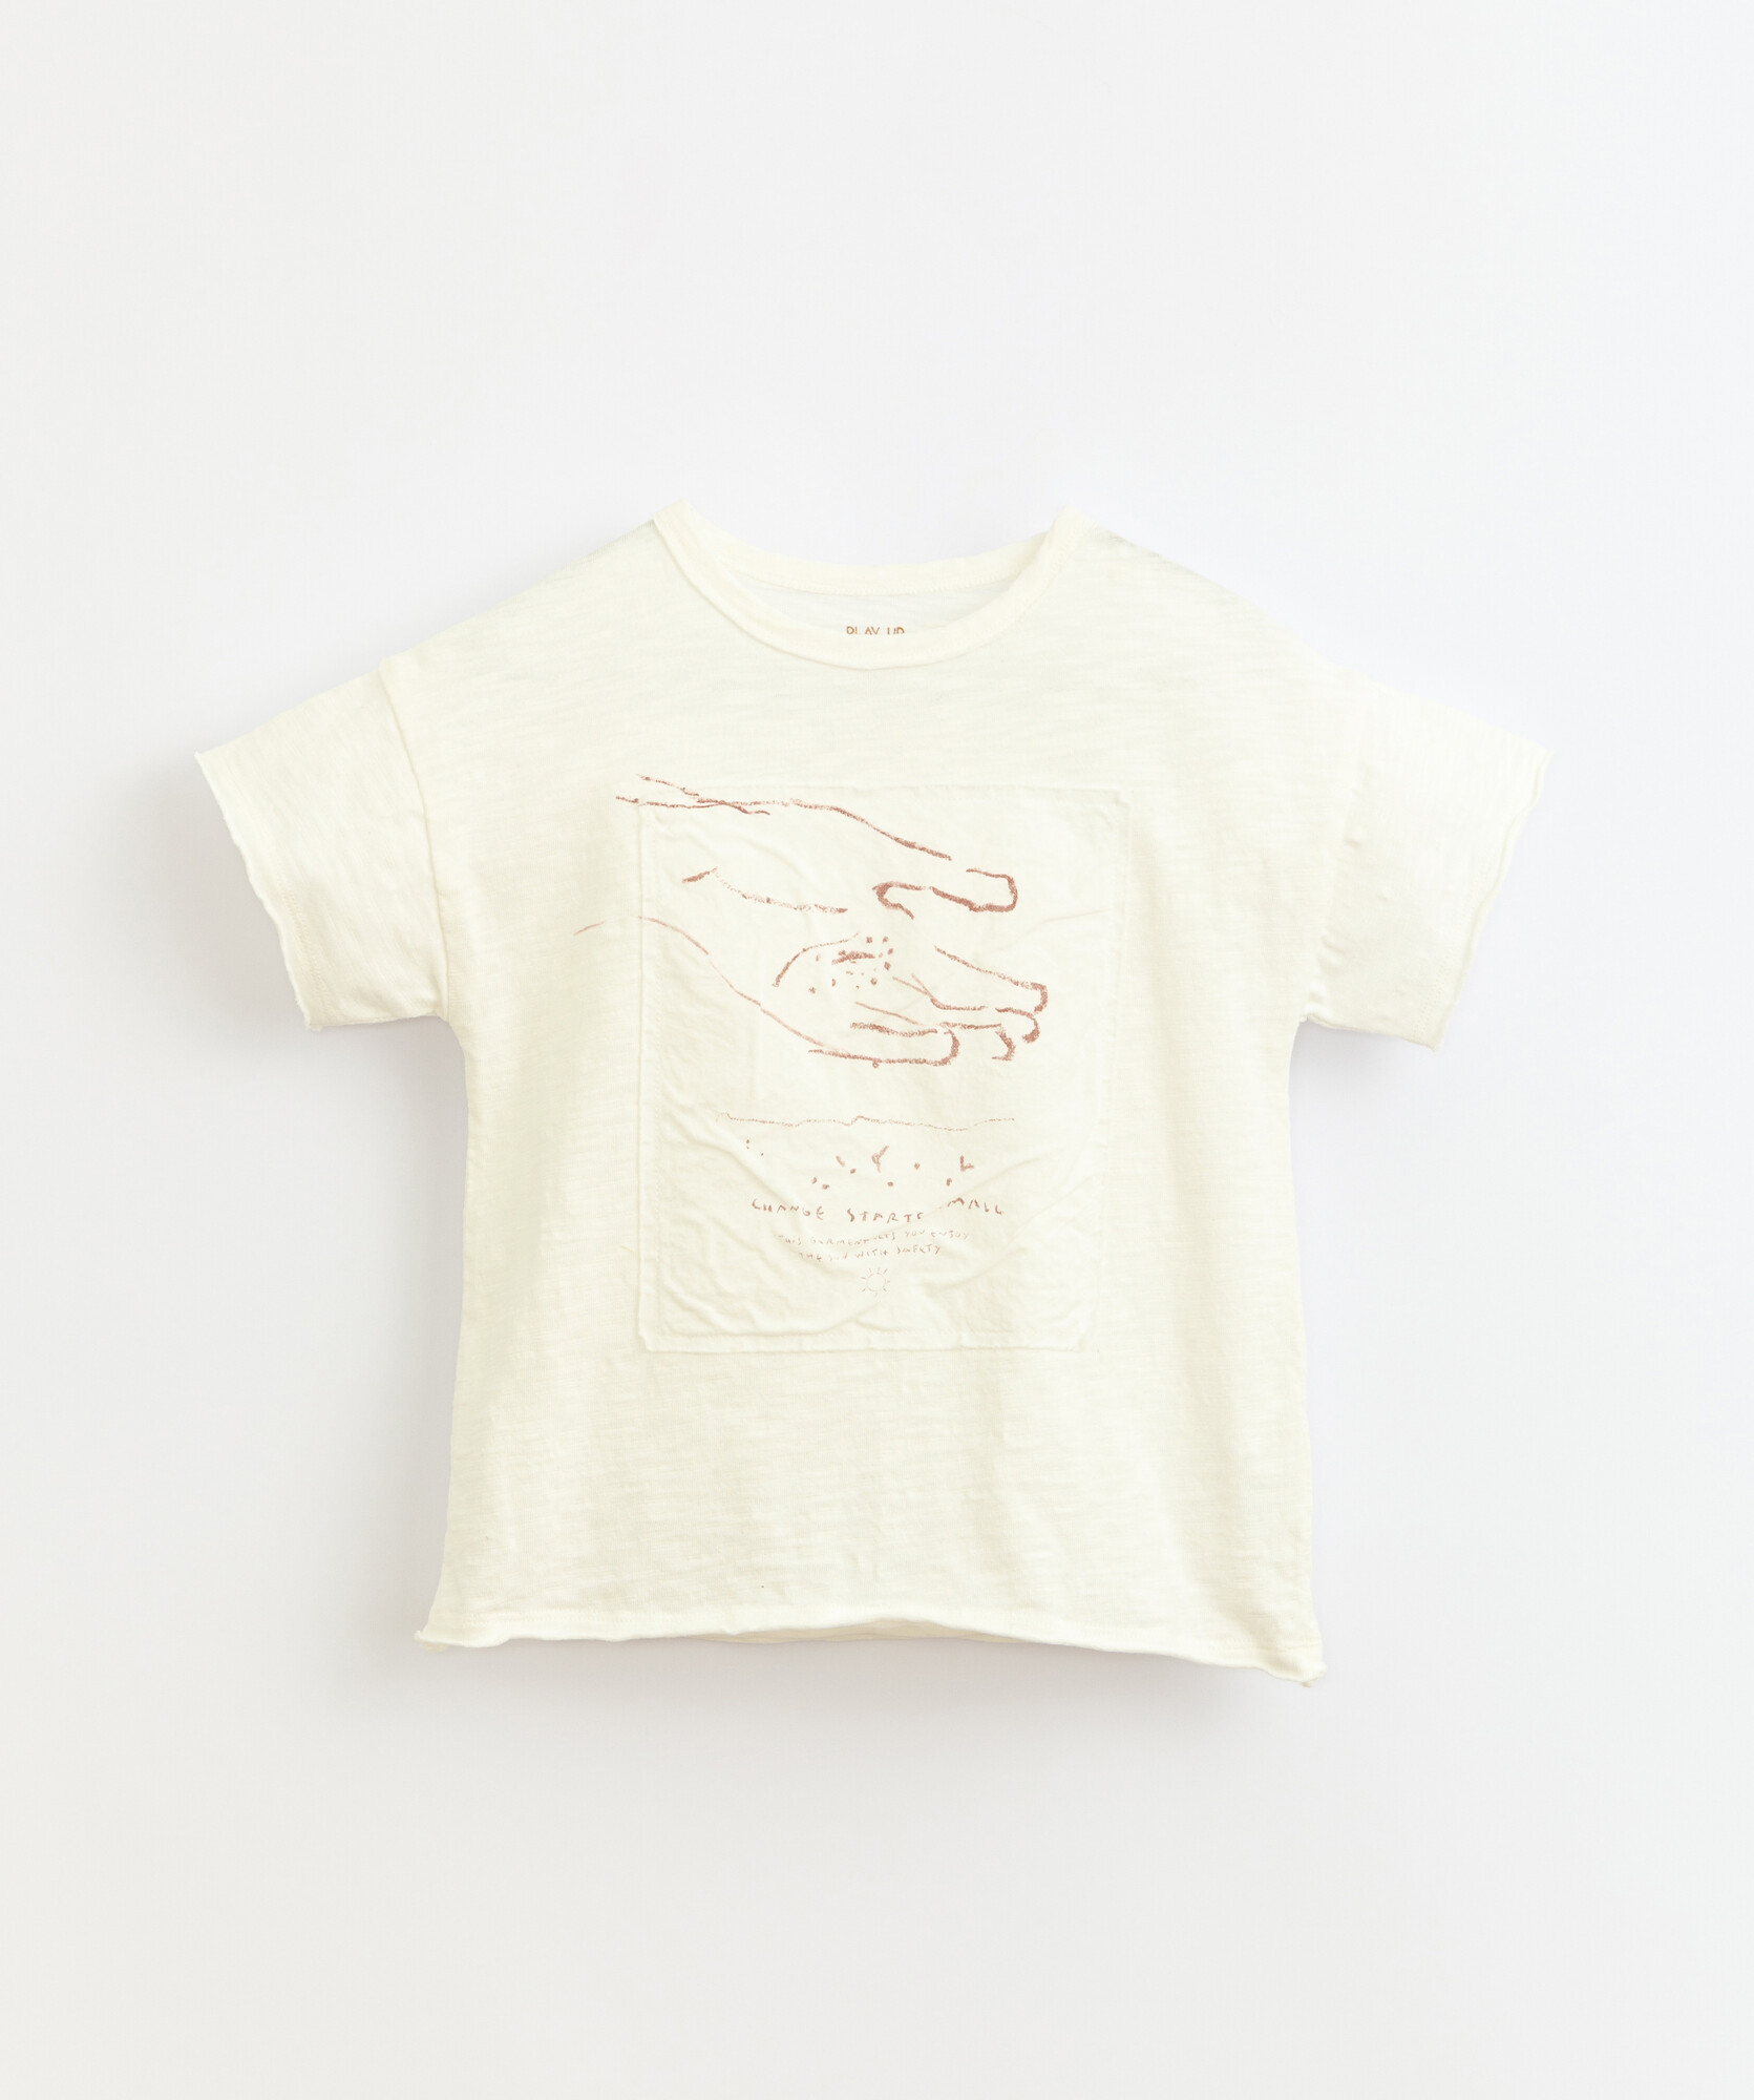 Flamé Jersey Anti-UV  T-Shirt - Windflower